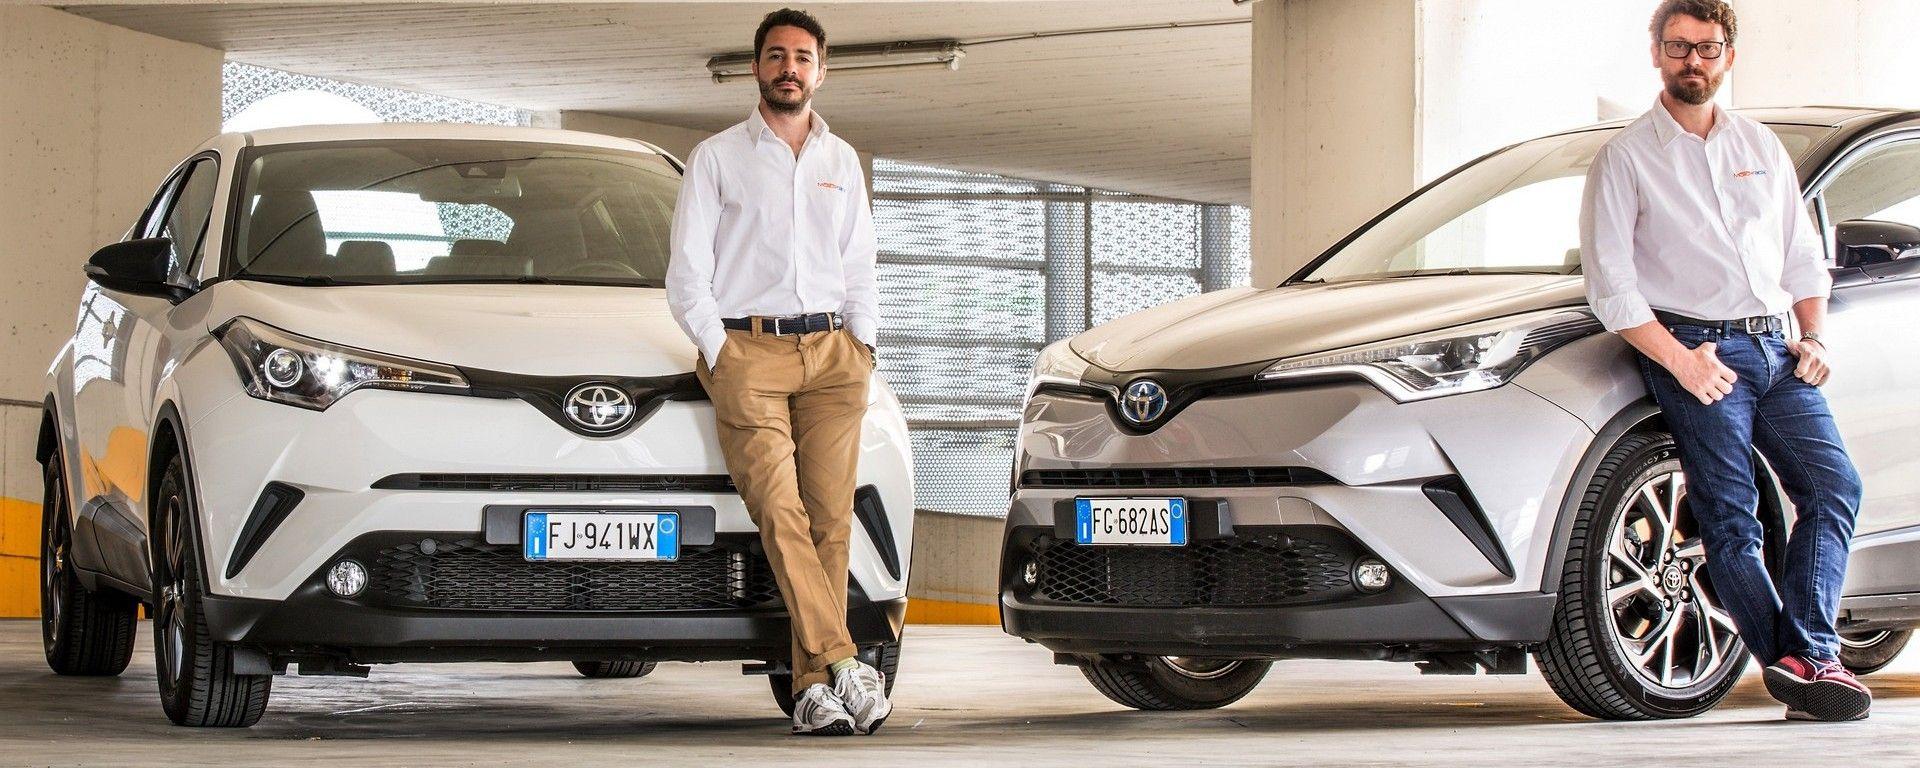 Quale scegliere: Toyota C-HR Hybrid  vs Toyota C-HR 1.2 Turbo